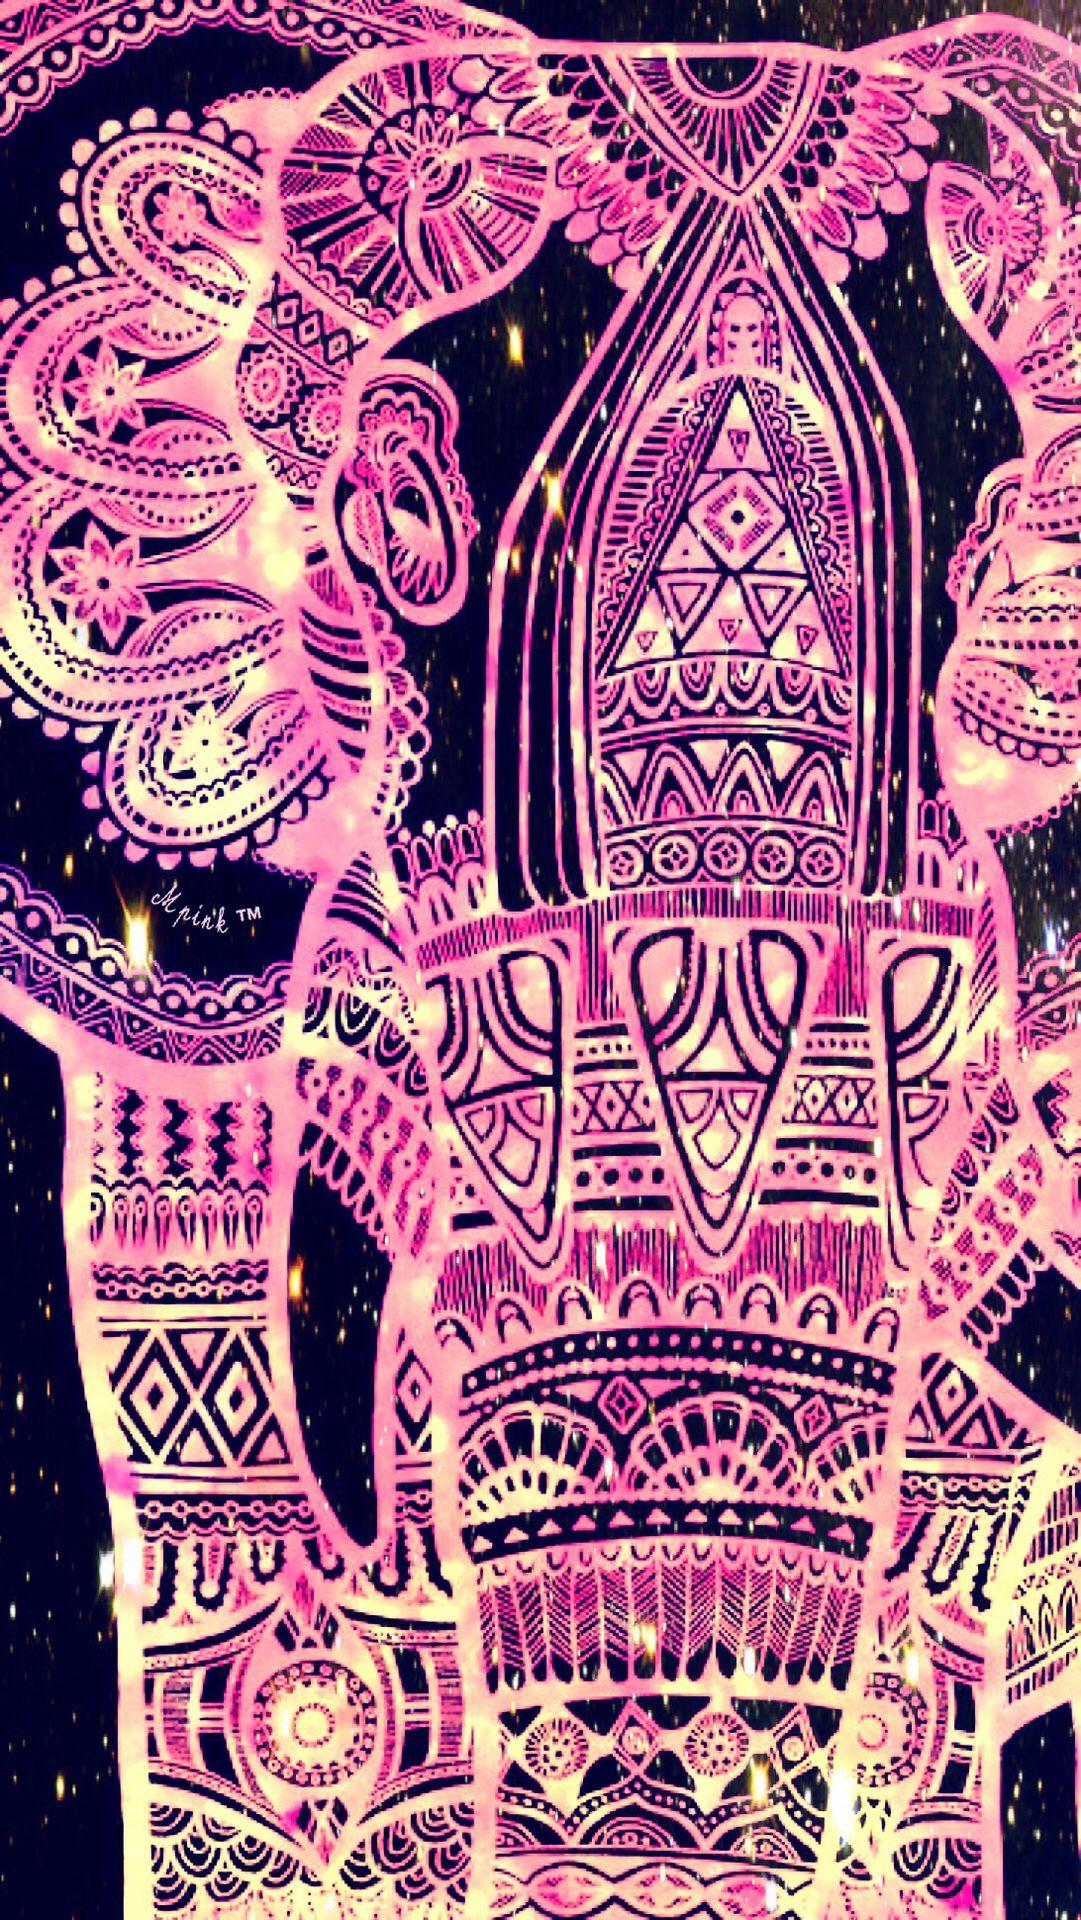 Tribal Pink Elephant Wallpaper/Lockscreen Girly, Cute